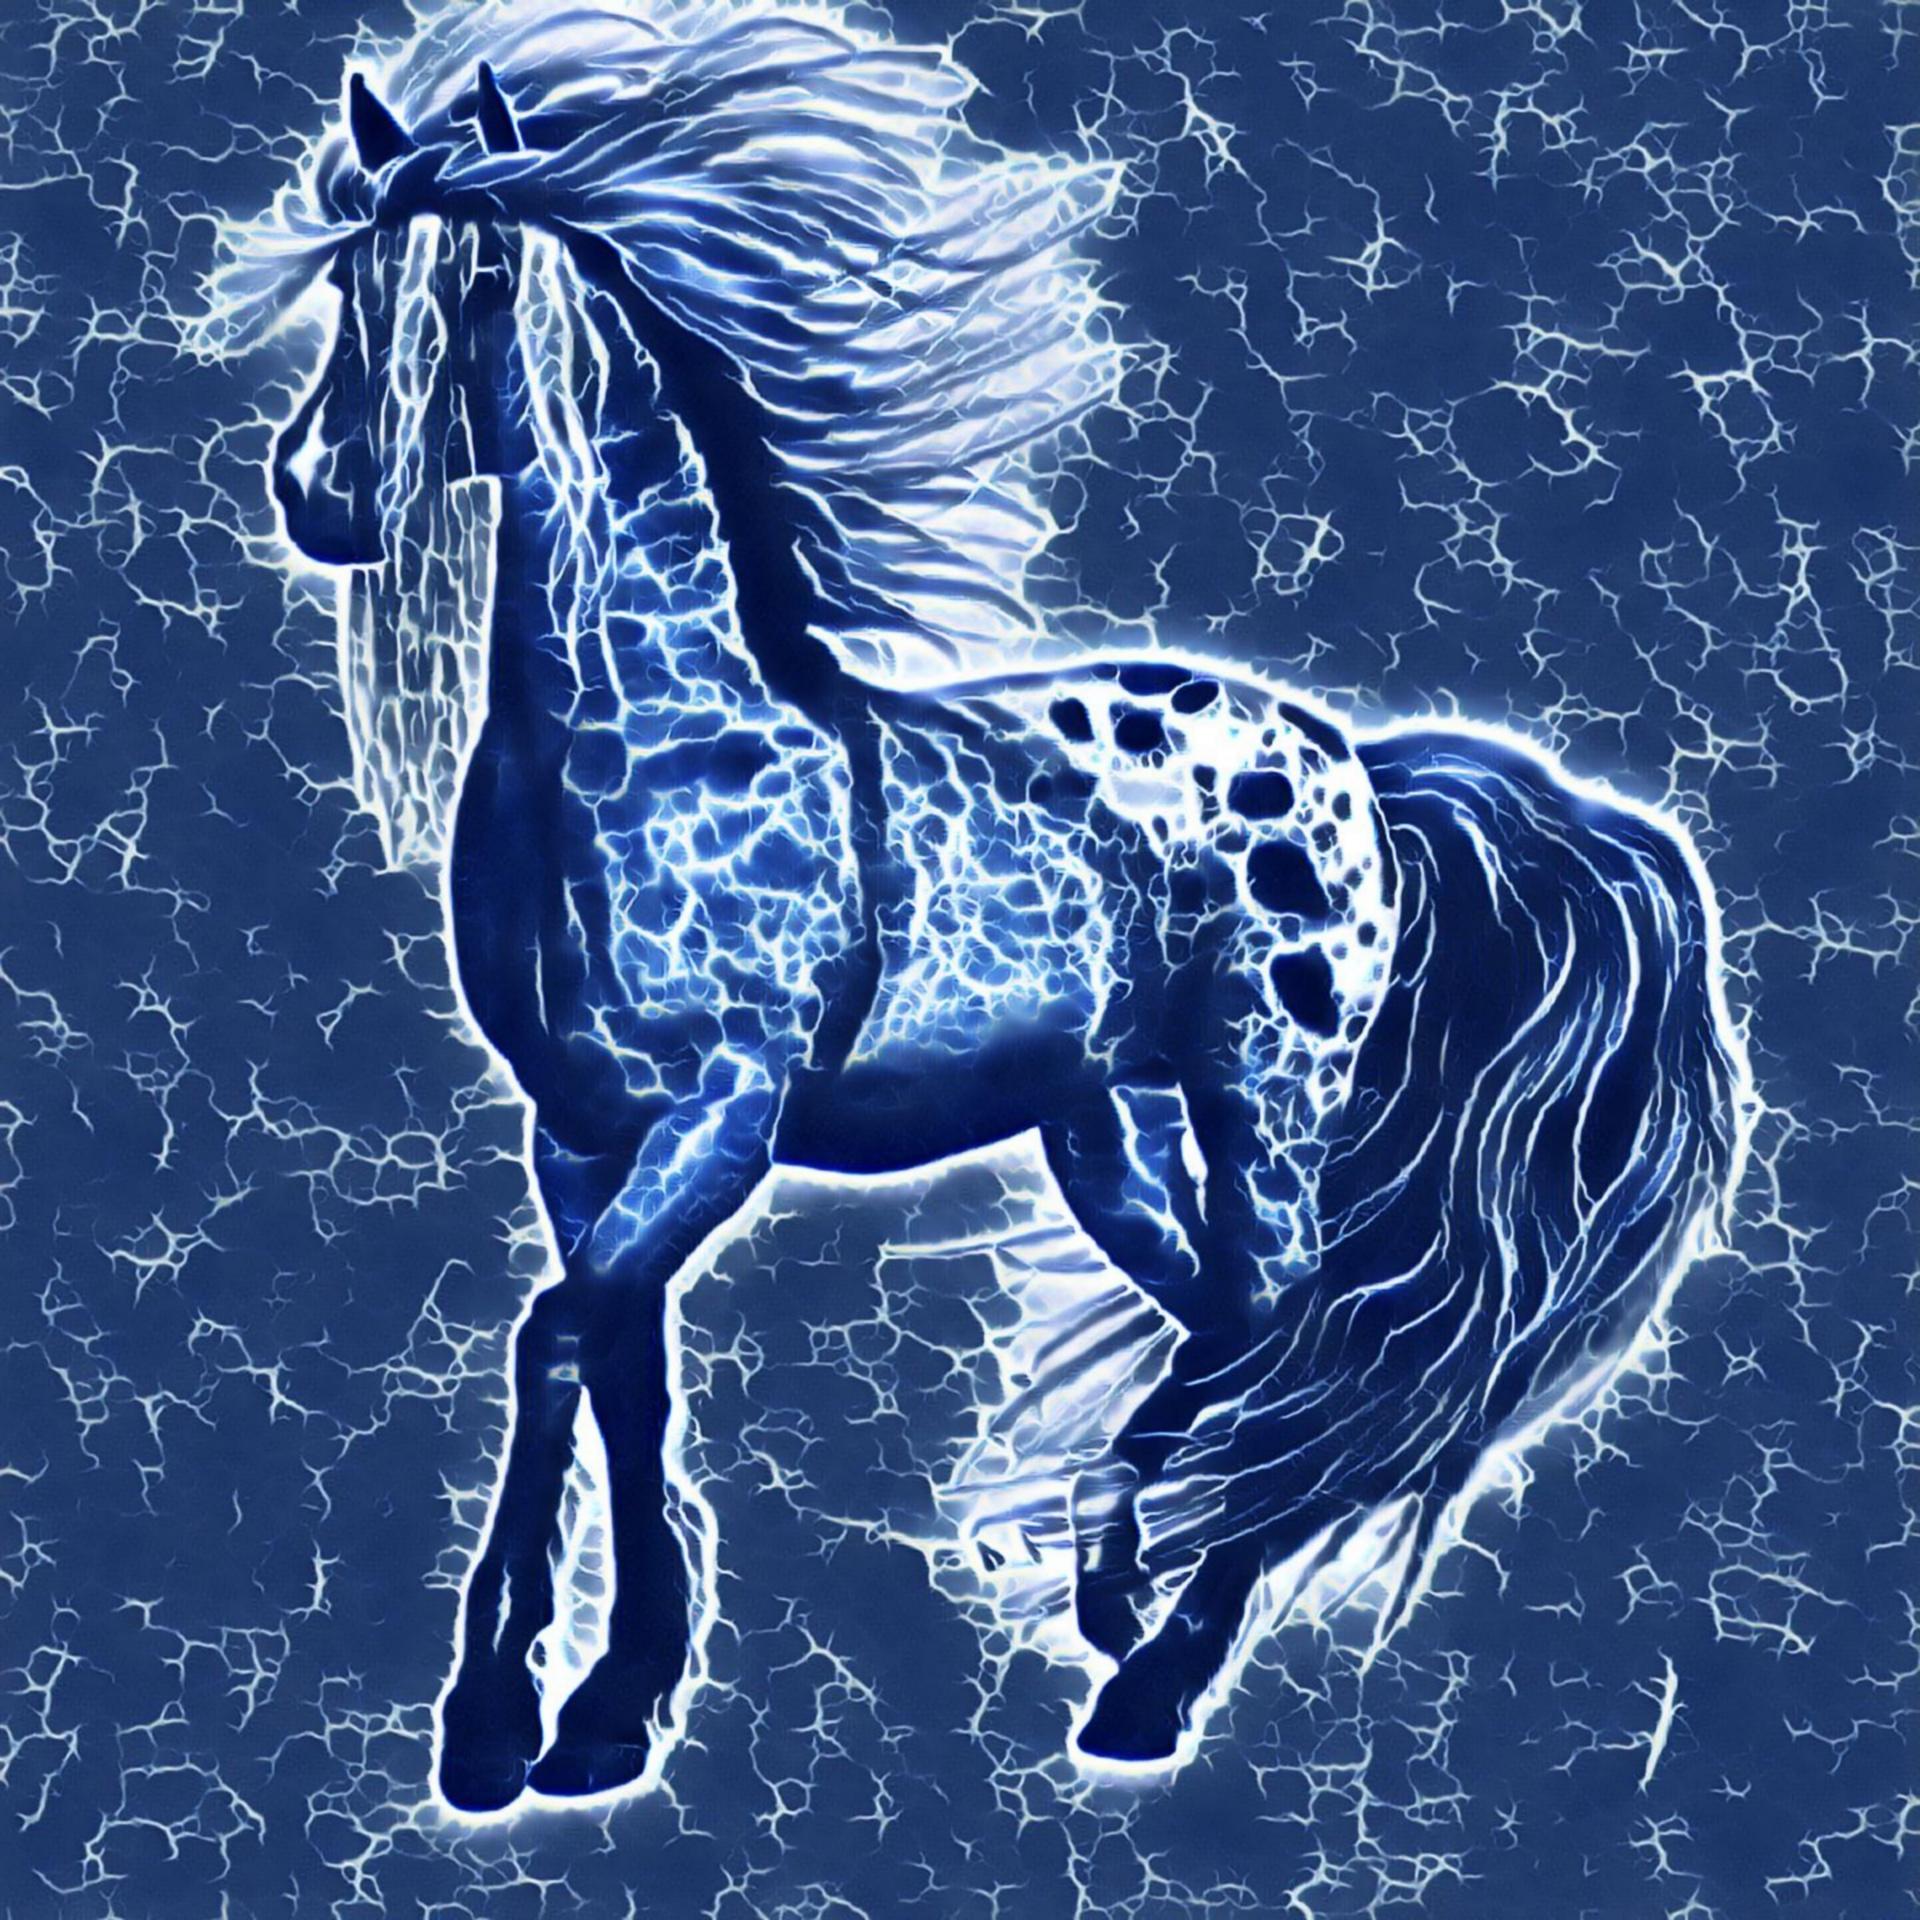 Fantasy Water Horse Art Abstract Free Image From Needpix Com